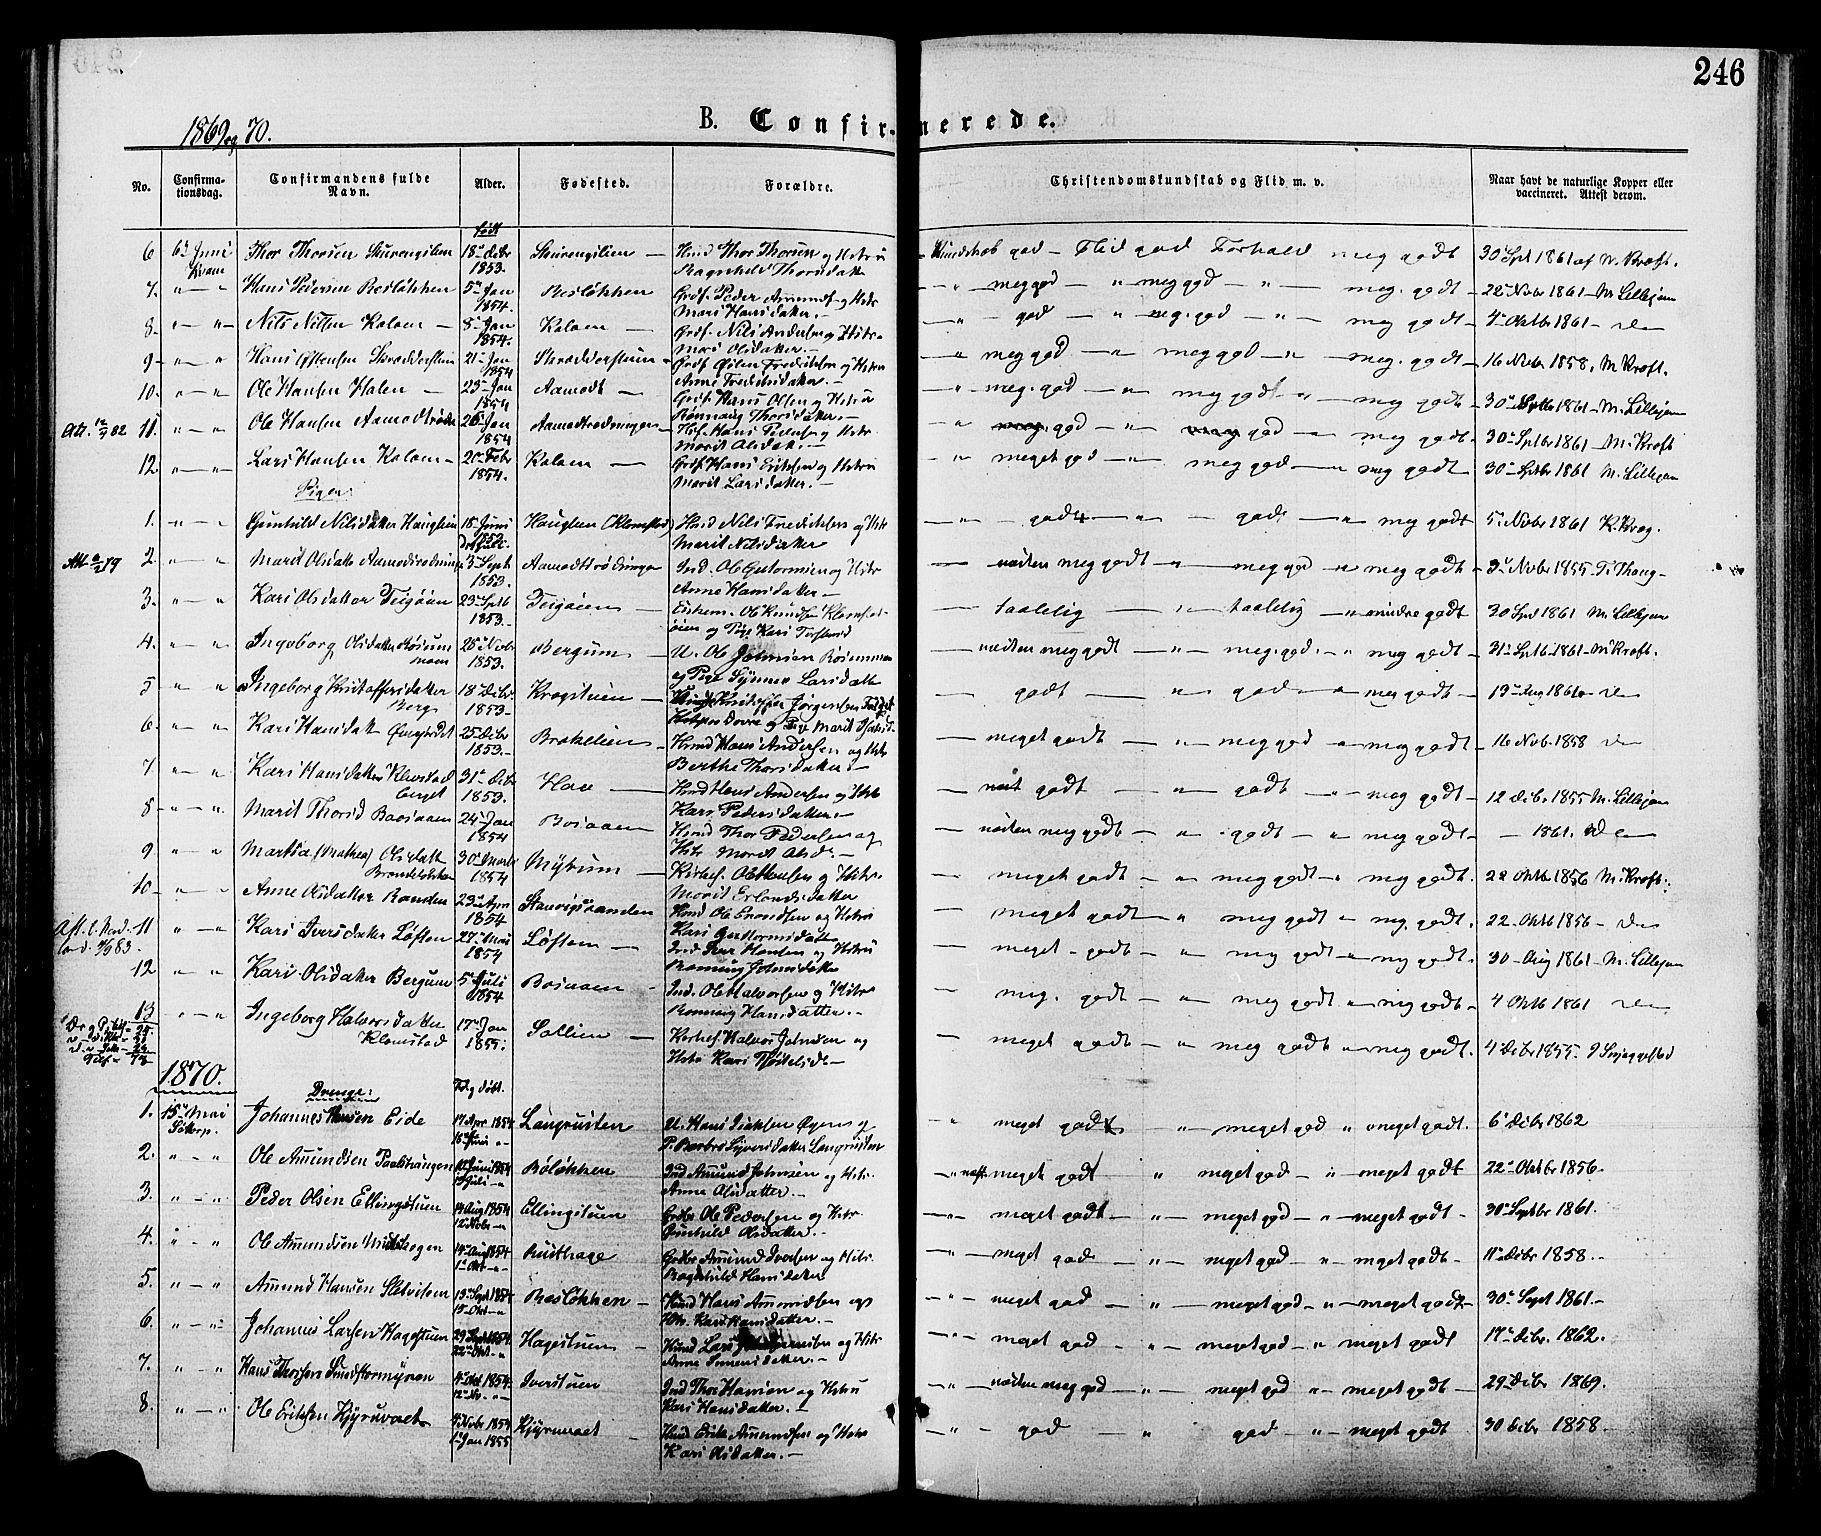 SAH, Nord-Fron prestekontor, Ministerialbok nr. 2, 1865-1883, s. 246